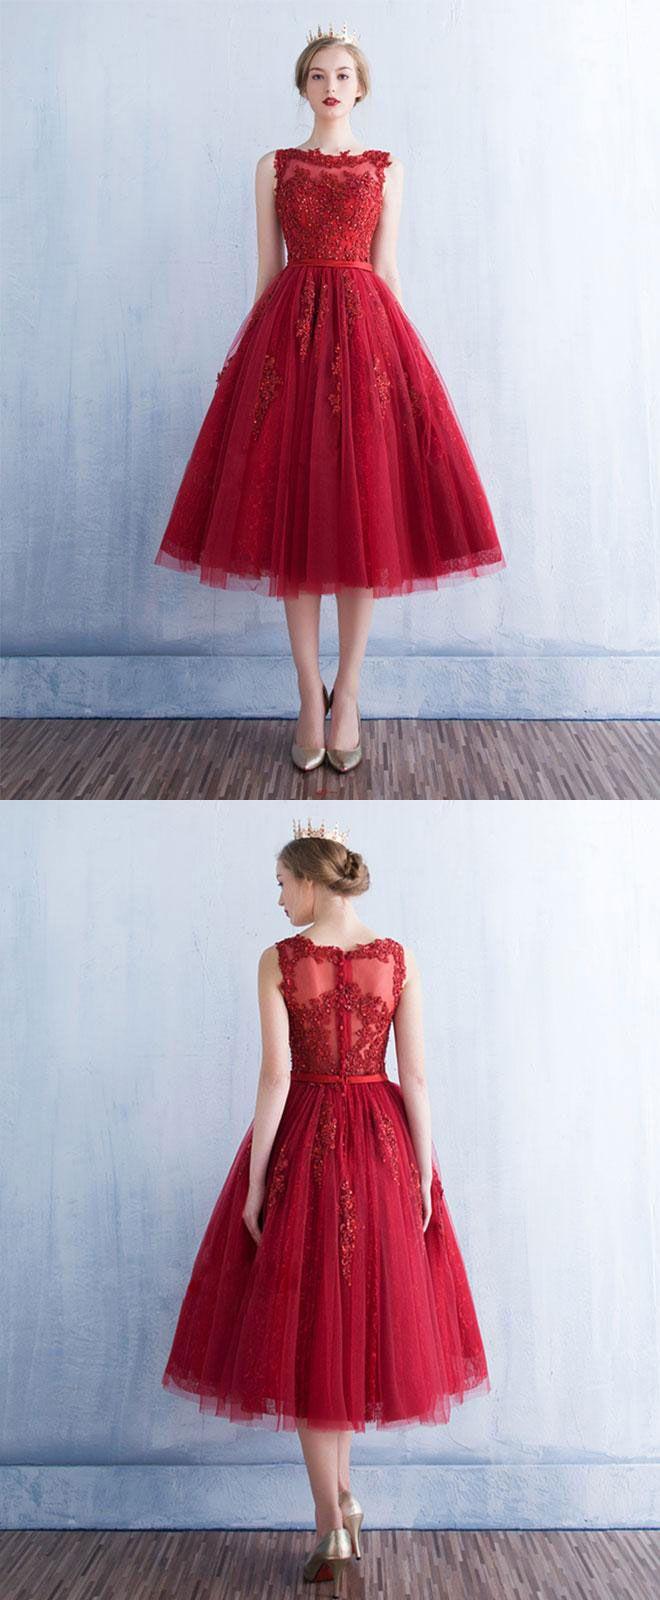 bbc1d6a3c7e Burgundy round neck tulle lace short prom dress